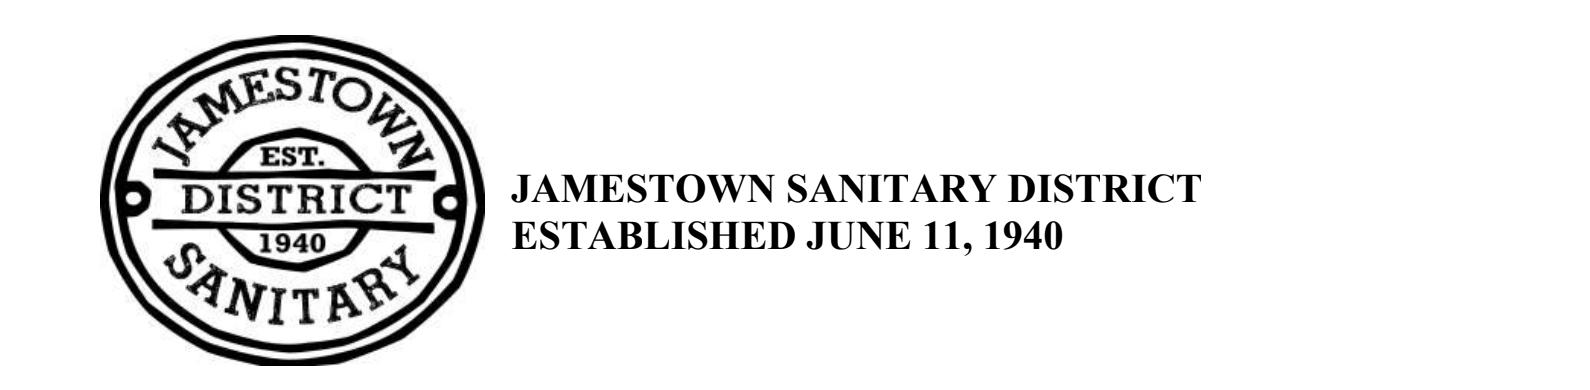 Jamestown Sanitary District